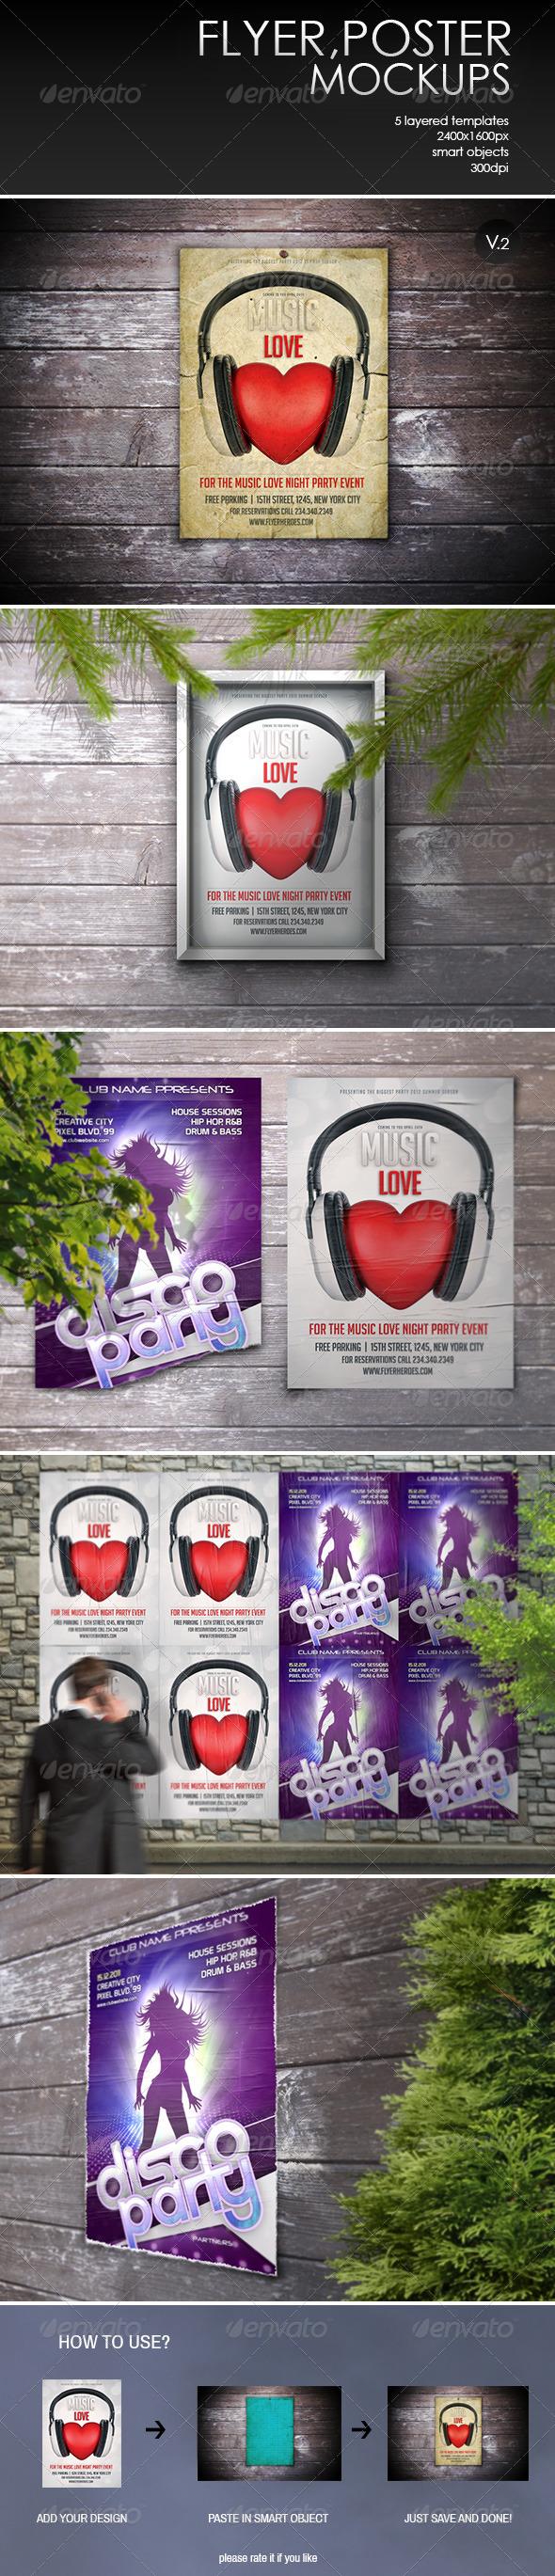 GraphicRiver Flyer Poster Mockup-Vol.2 7876003